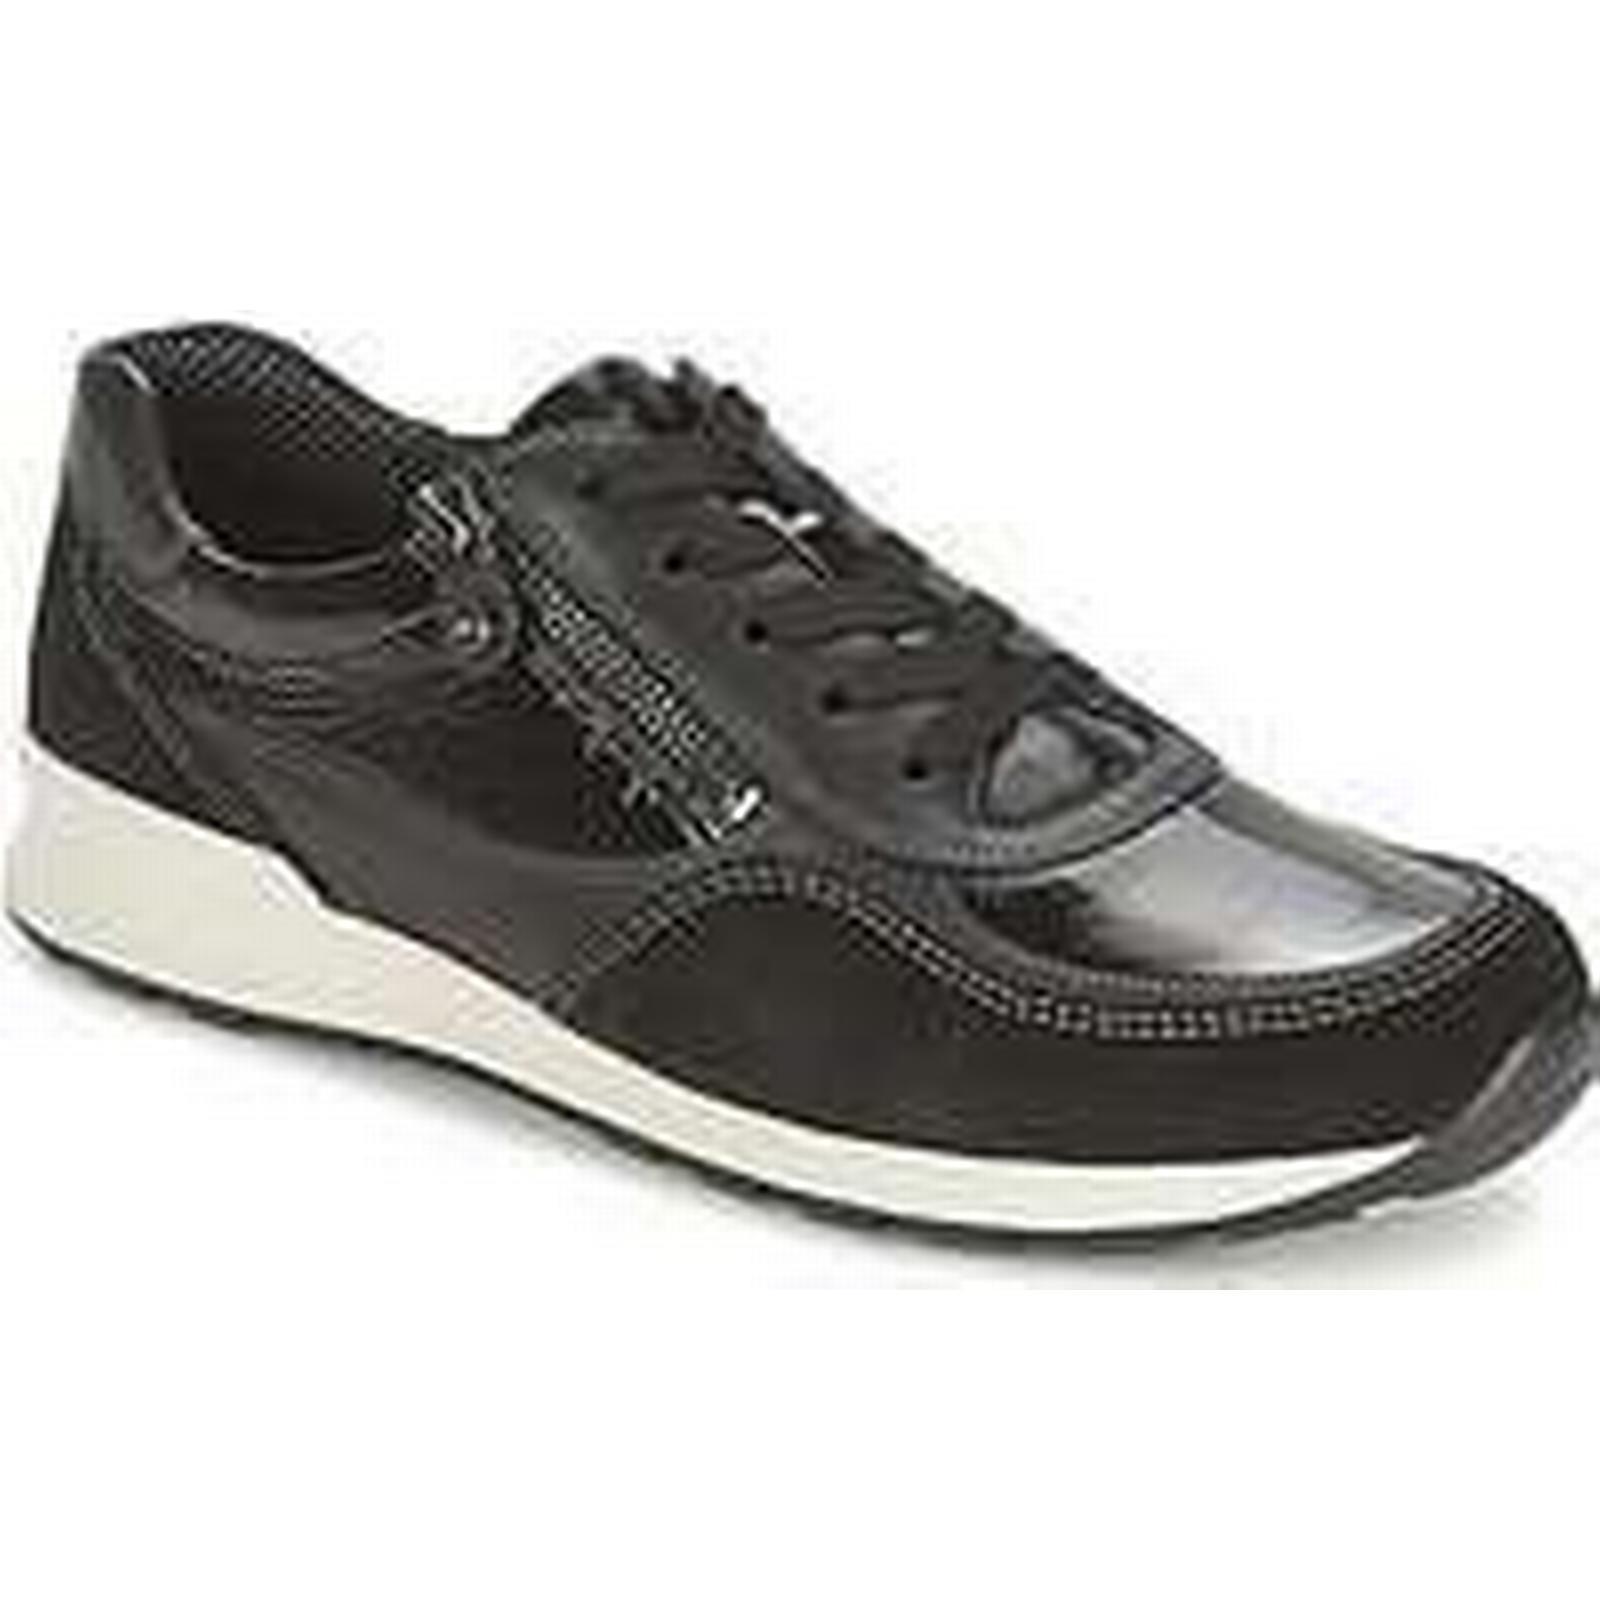 Spartoo.co.uk Ara Shoes CHAGOU women's Shoes Ara (Trainers) in Black 0295b1